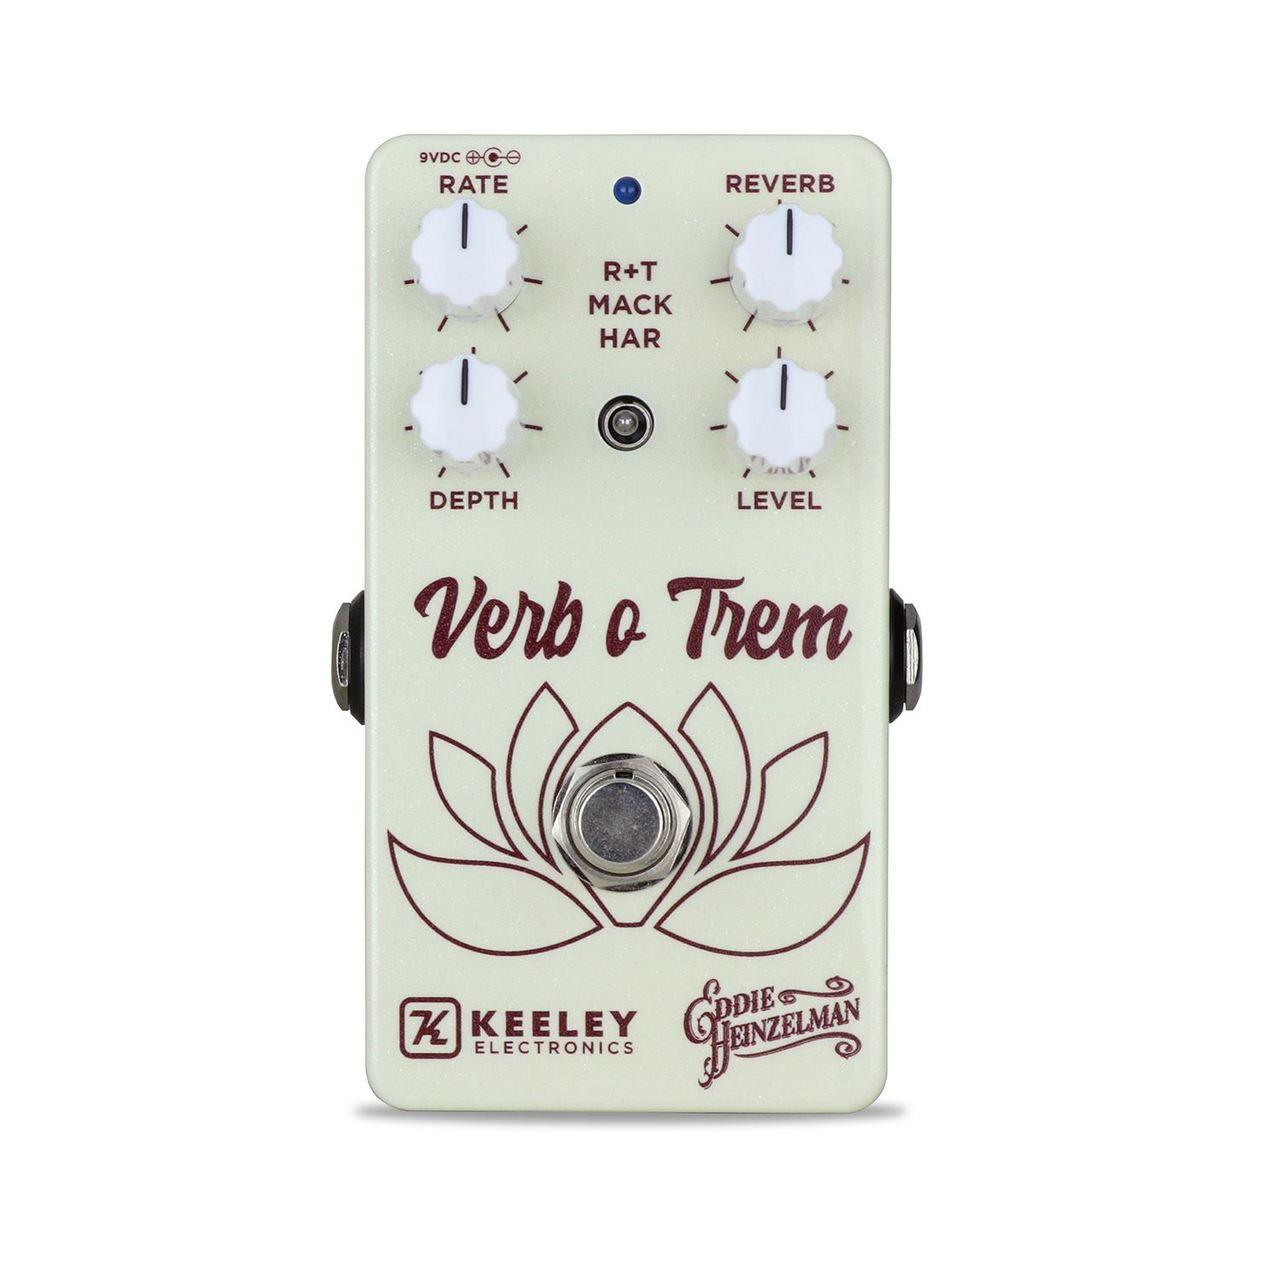 Keeley Electronics EH Verb O Trem Reverb & Tremolo pedal